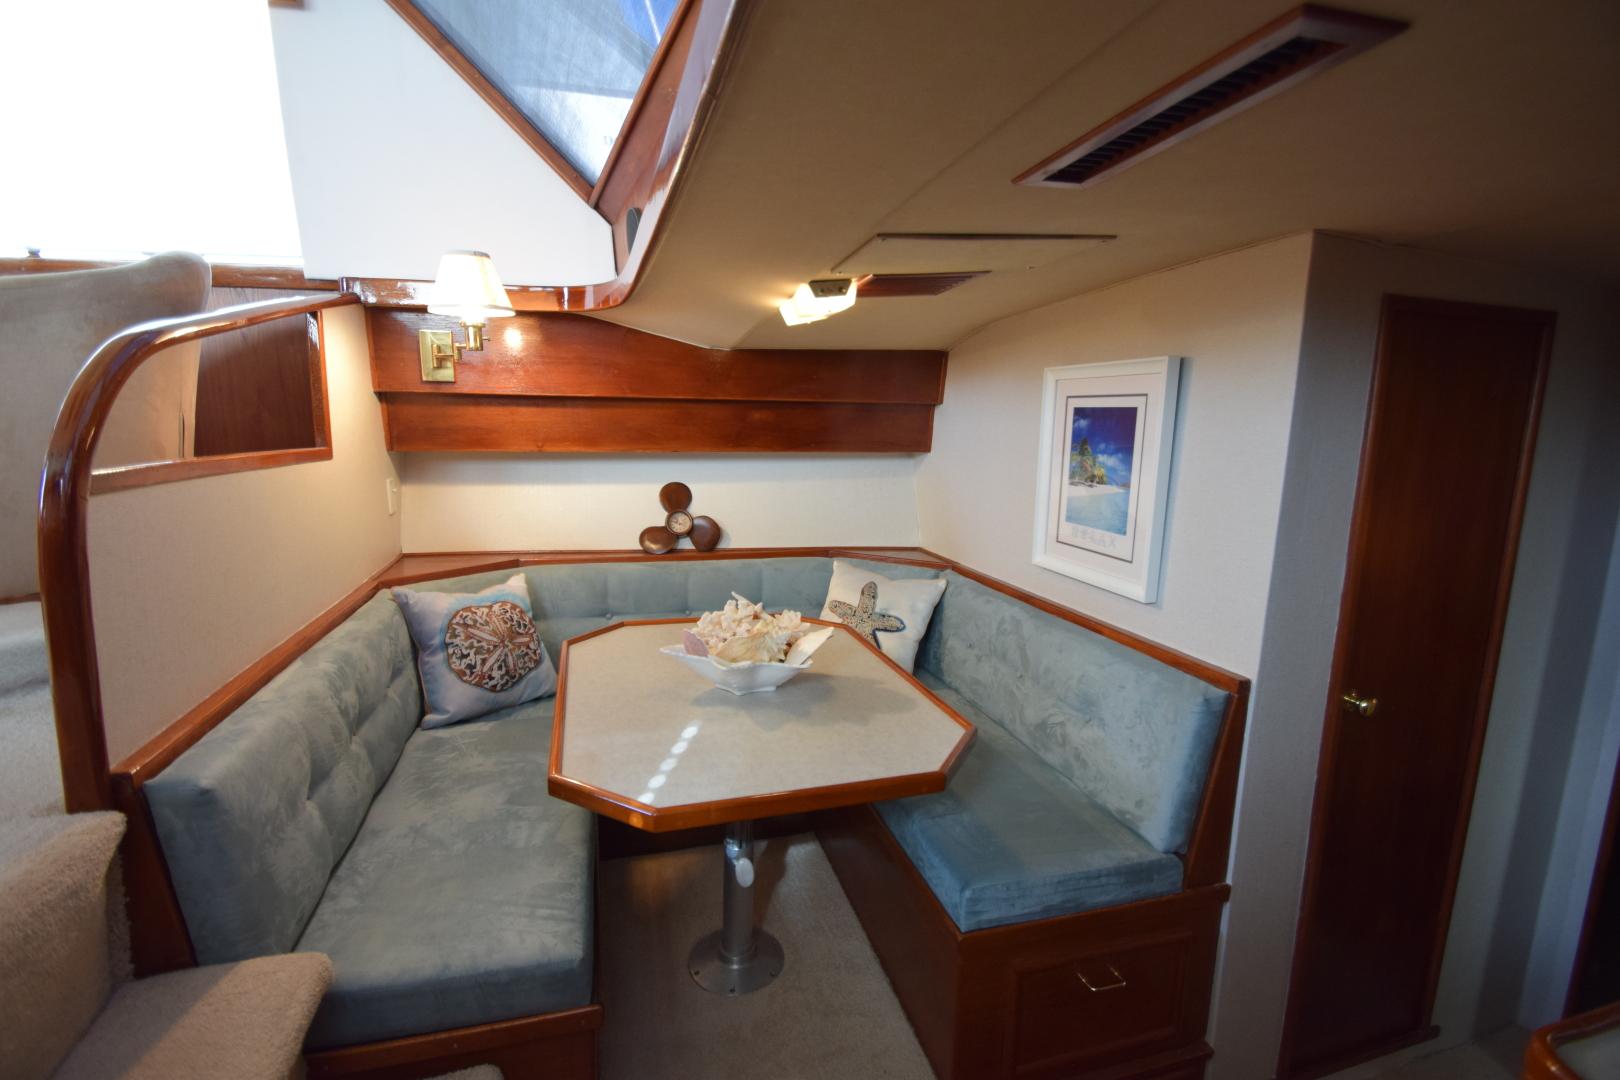 Ocean Yachts-46 Sunliner 1986-Sugah Portsmouth-Virginia-United States-1555501 | Thumbnail